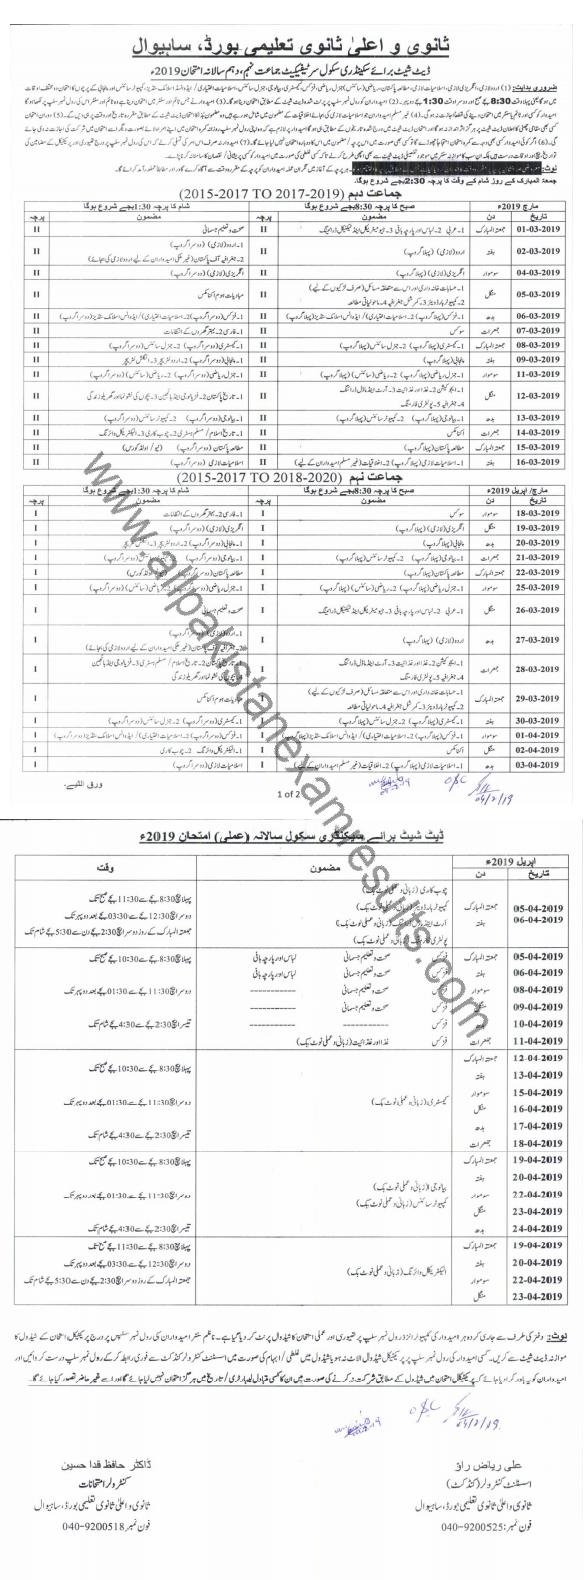 BISE Sahiwal 9th Class Date Sheet 2019